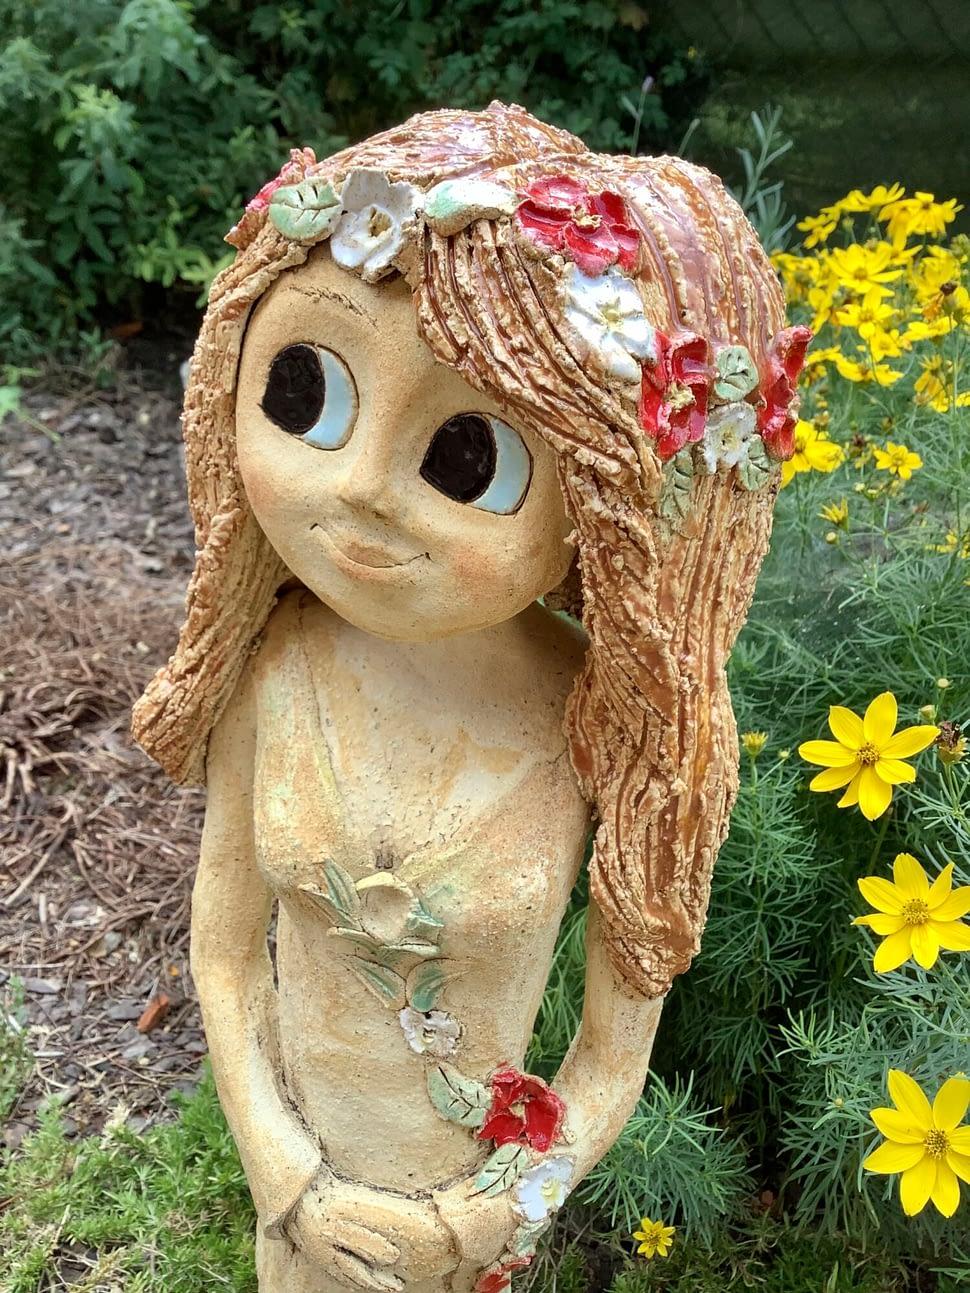 Velká vila květy červená zrzka dekorace socha keramika zahrada